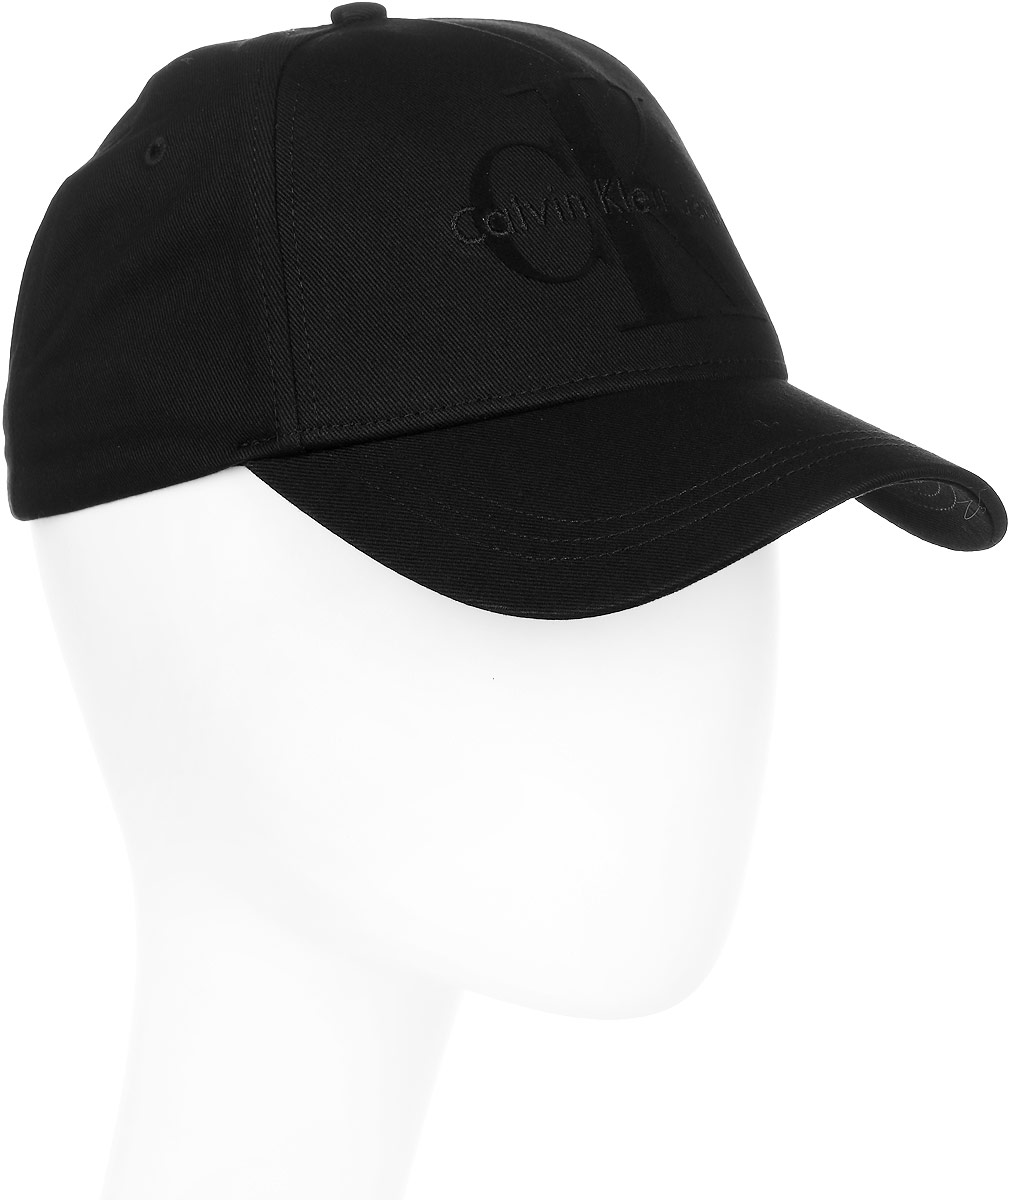 Шапка мужская Calvin Klein Jeans, цвет: черный. K50K503425/001. Размер универсальныйK50K503425/001